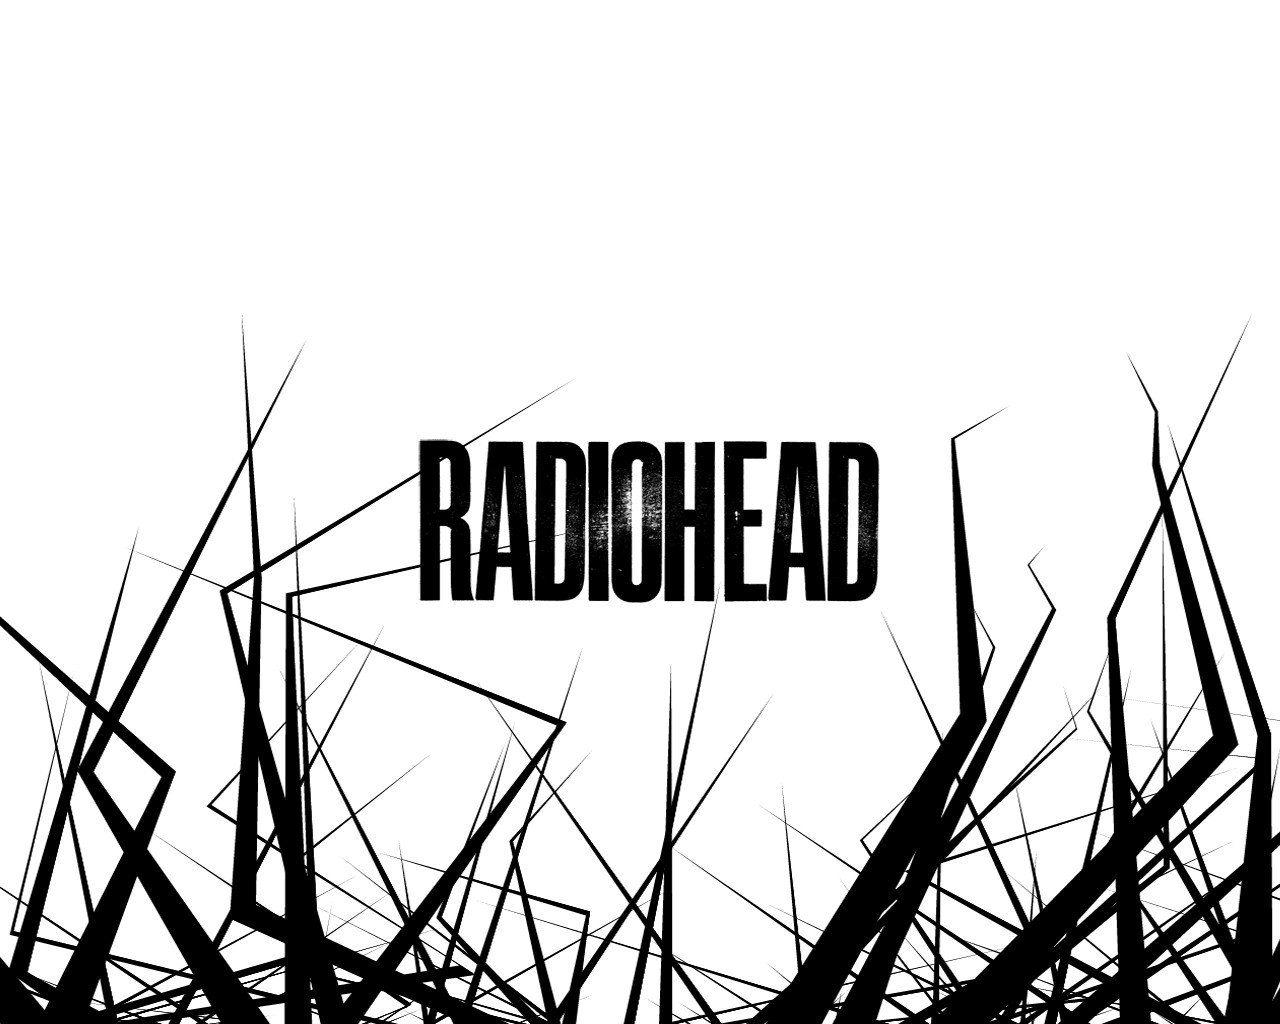 radiohead images radiohead wallpaper photos  27519292